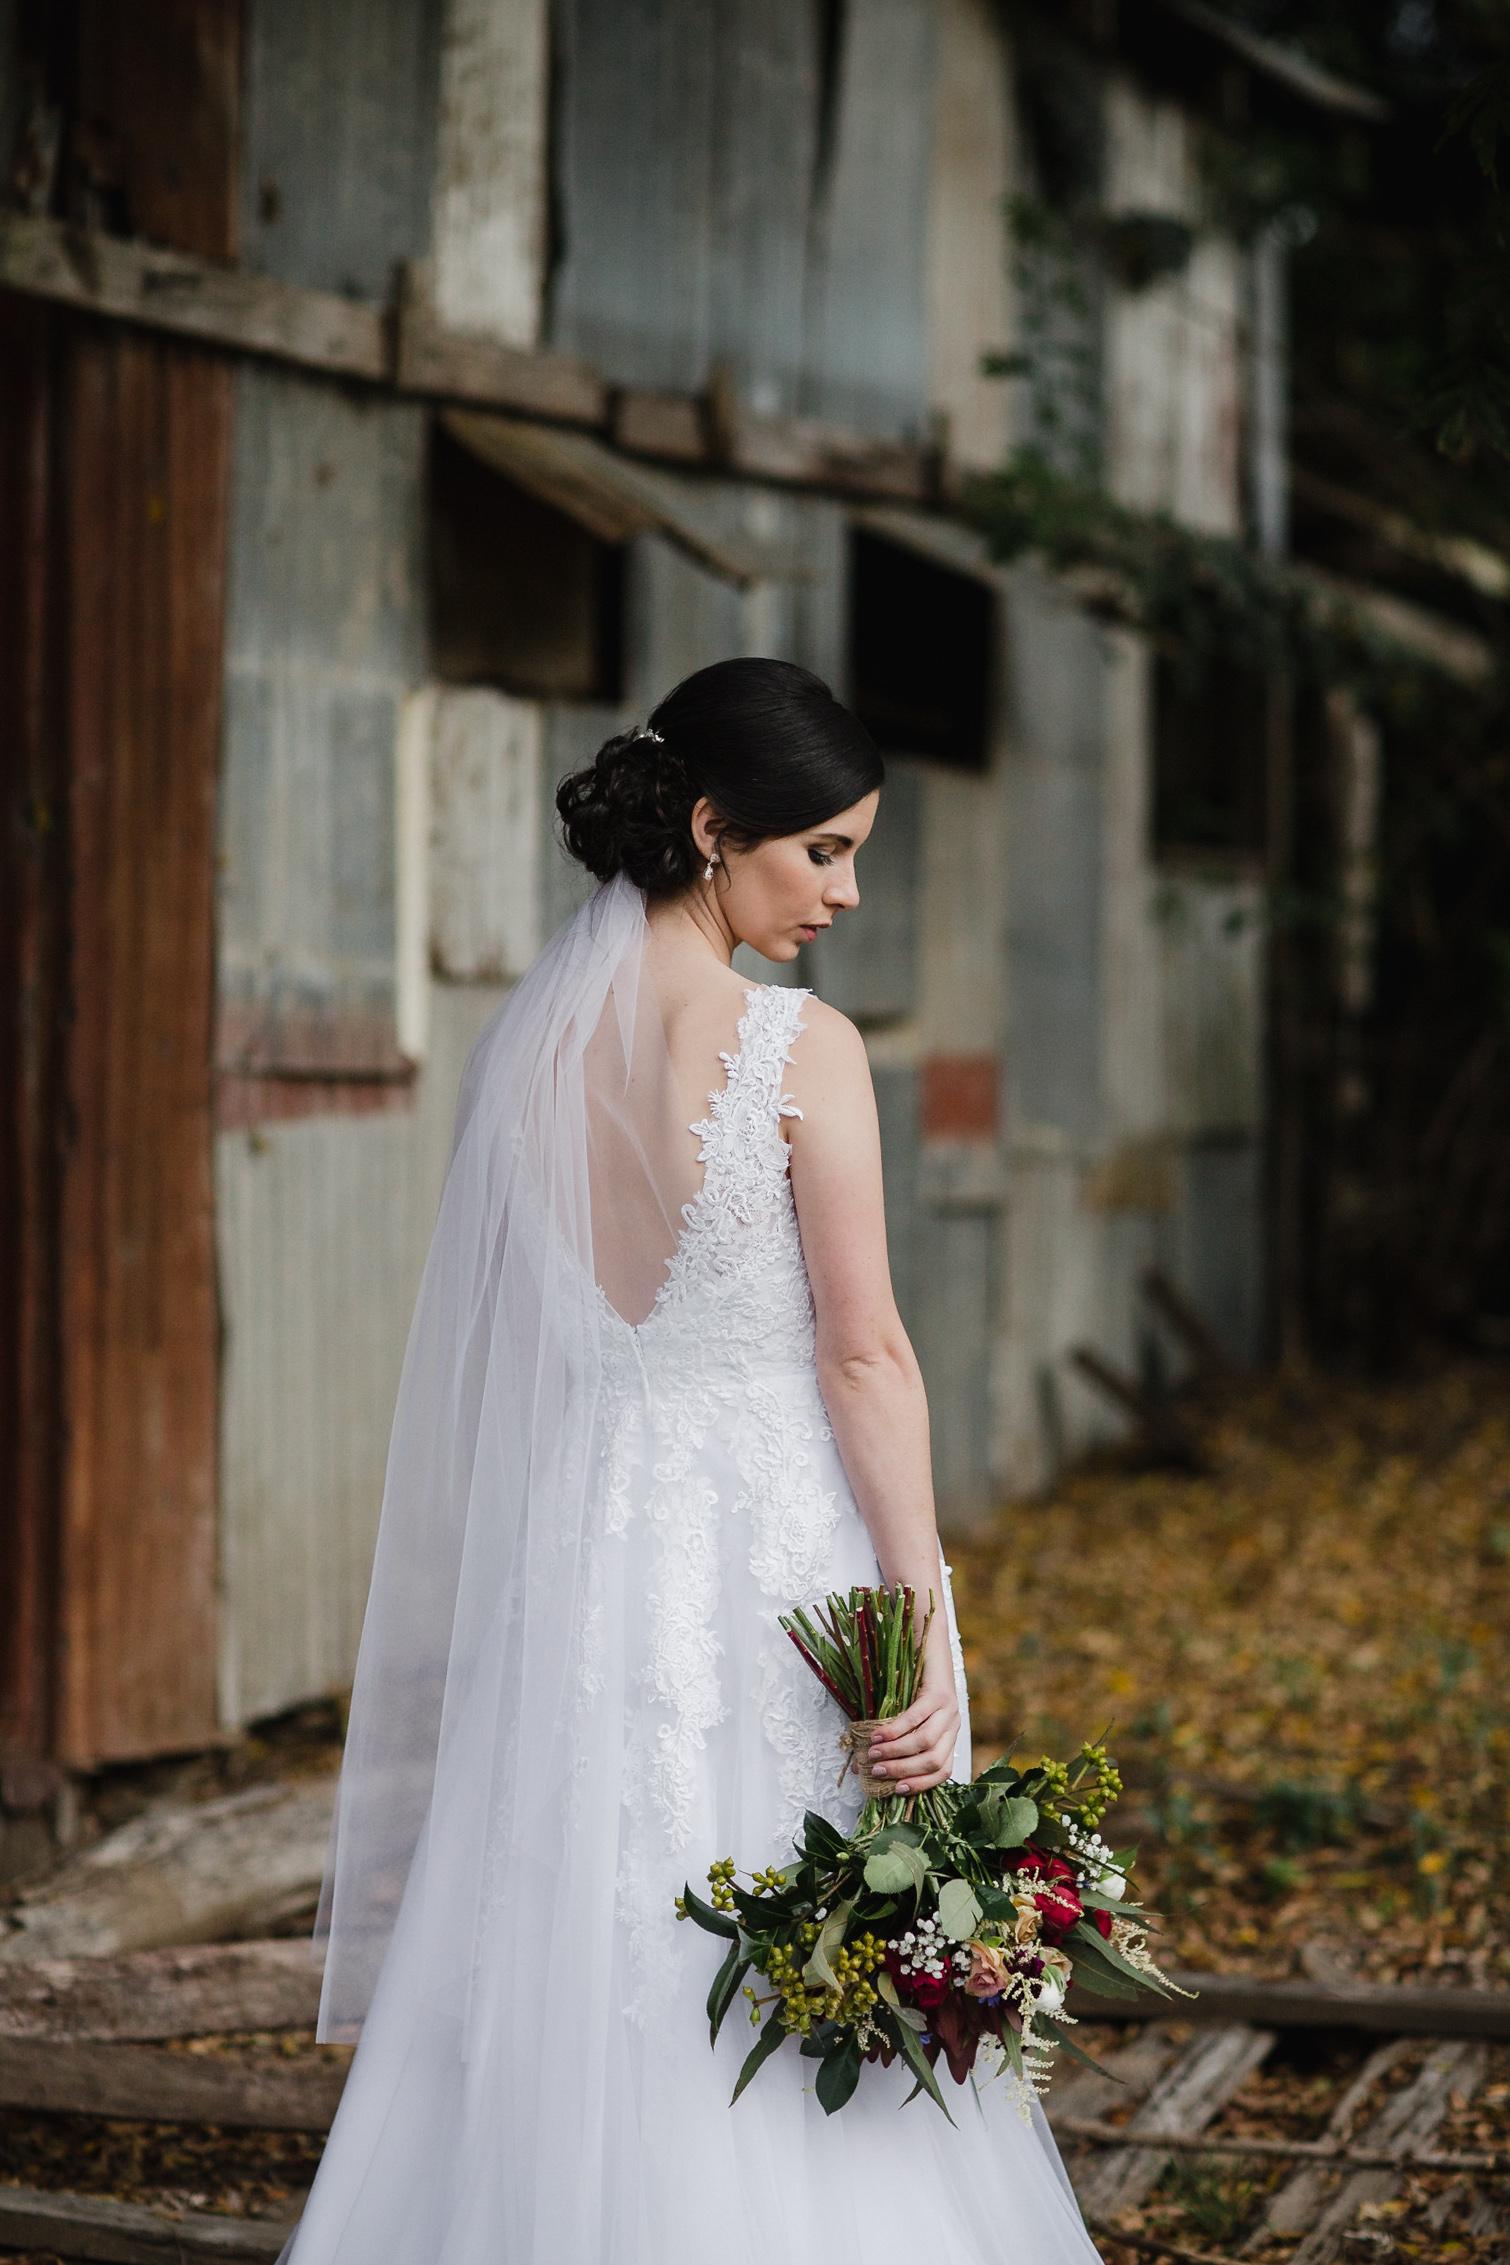 Boomerang_Farm_Gold_Coast_Wedding_Photography-196.jpg